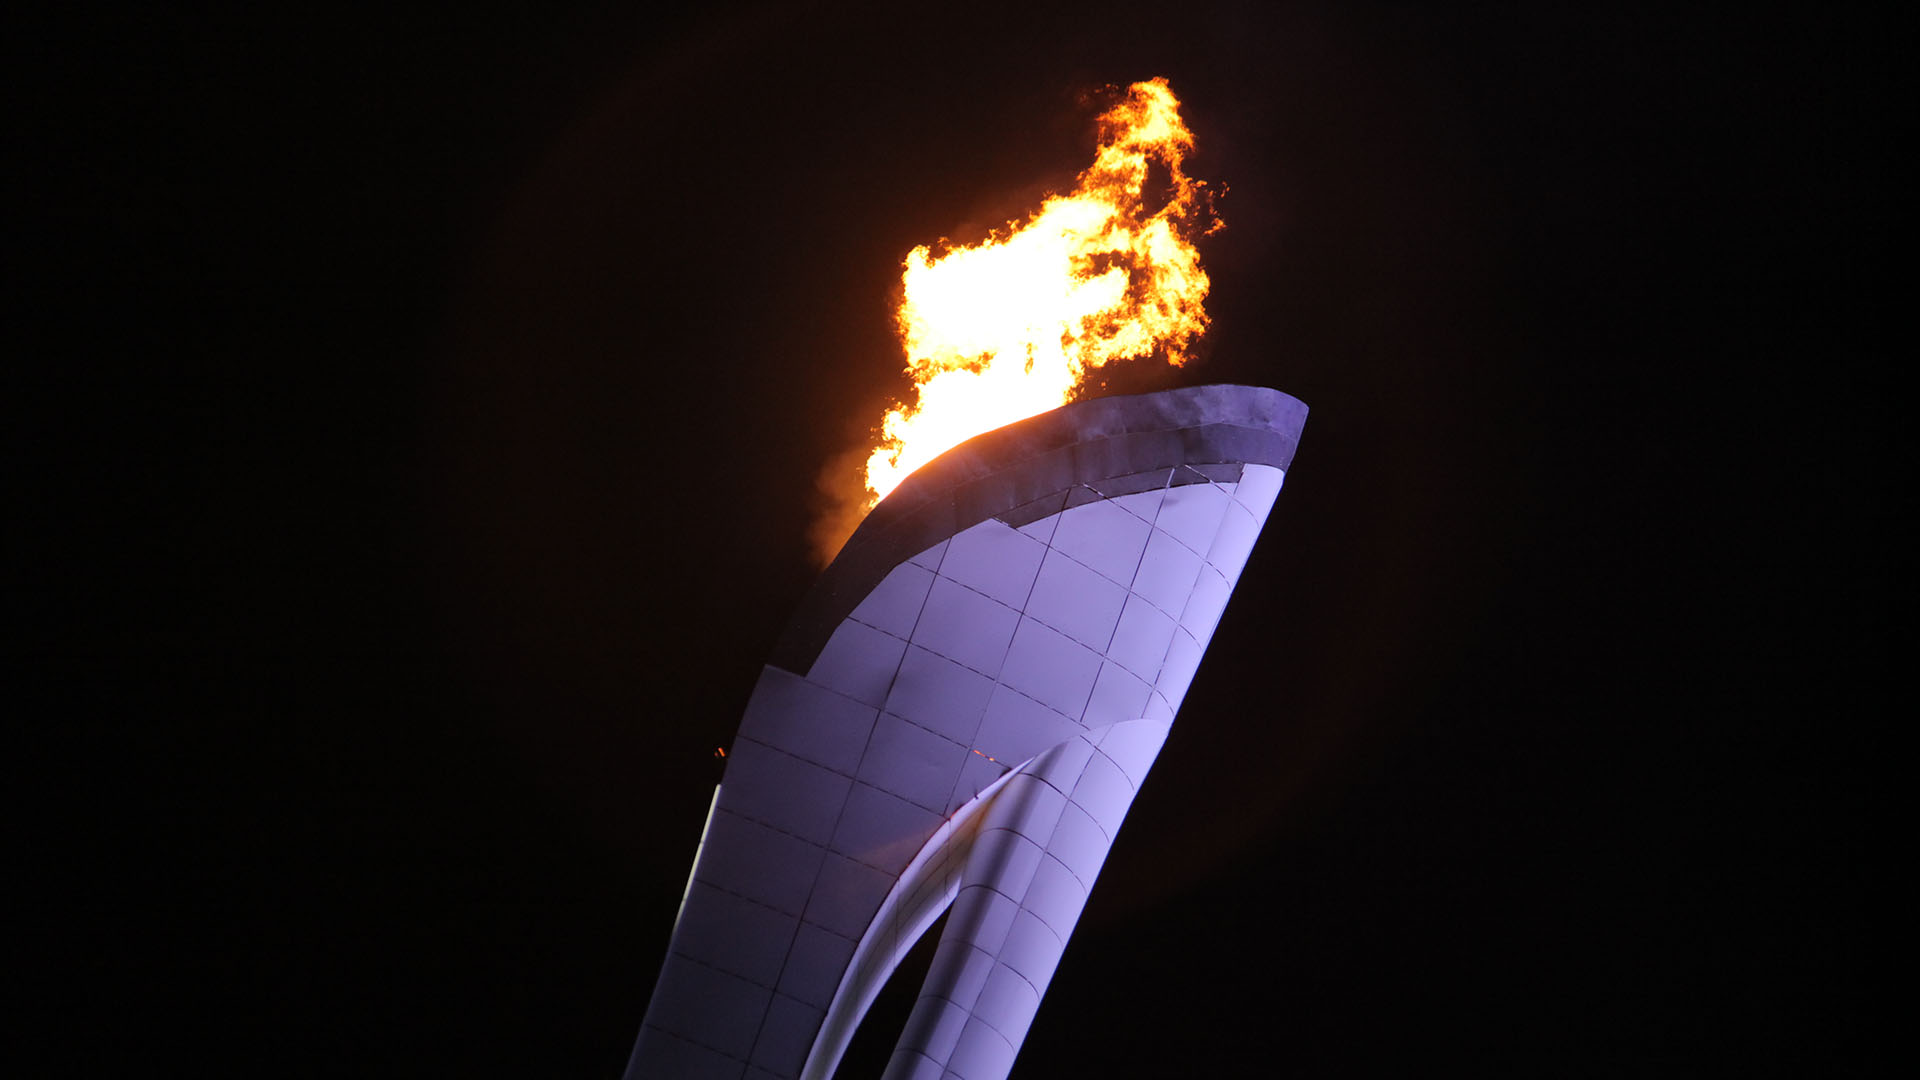 Living Medal Count Sochi 2014 Winter Olympics 01